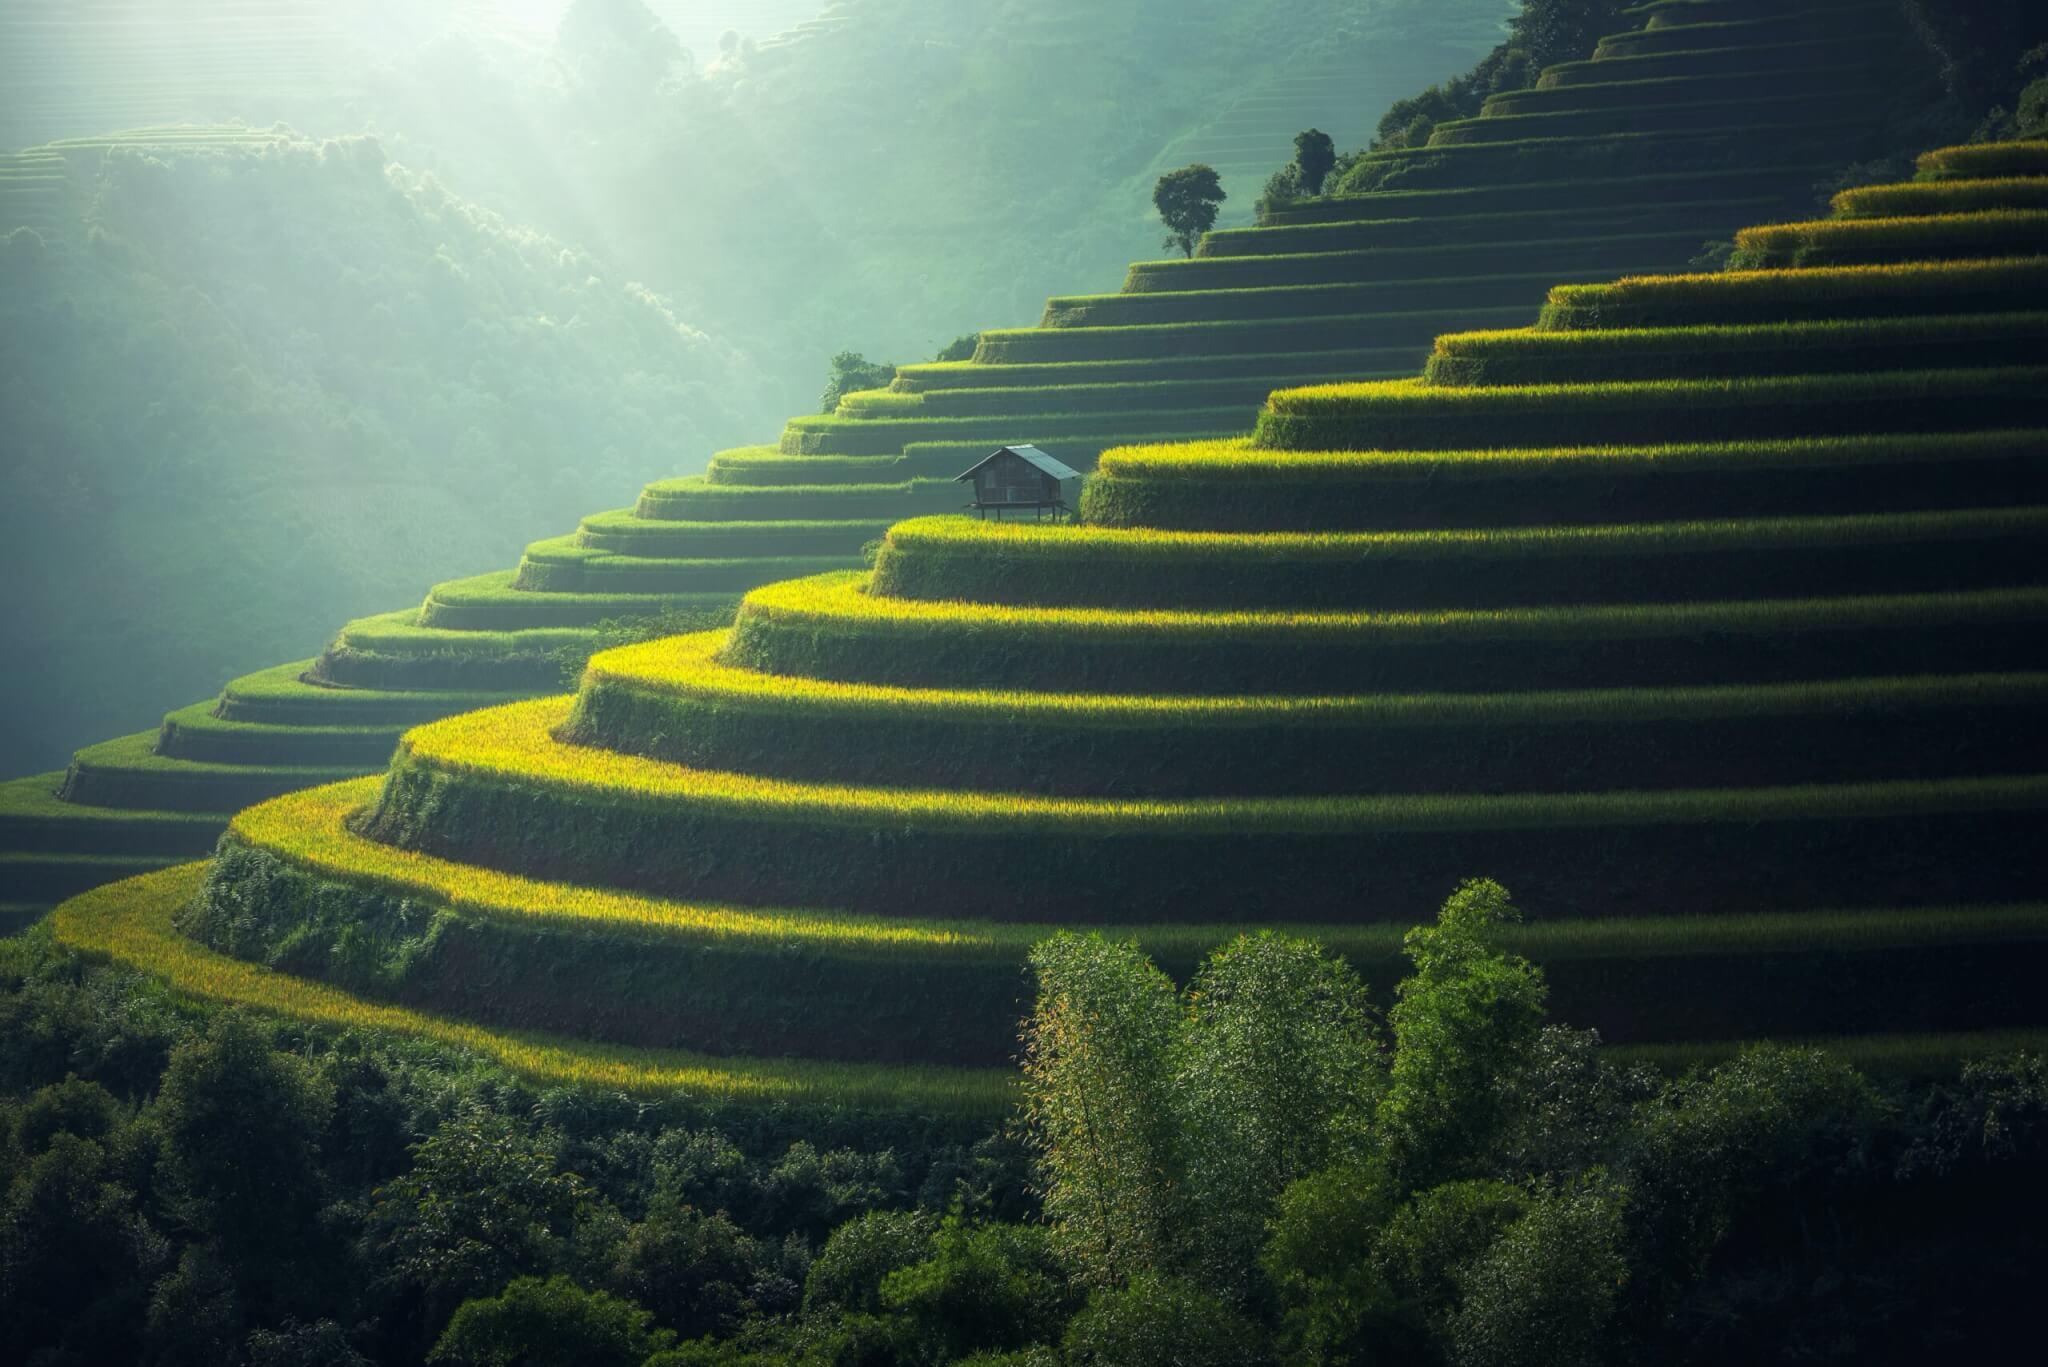 Rice terraces in India.